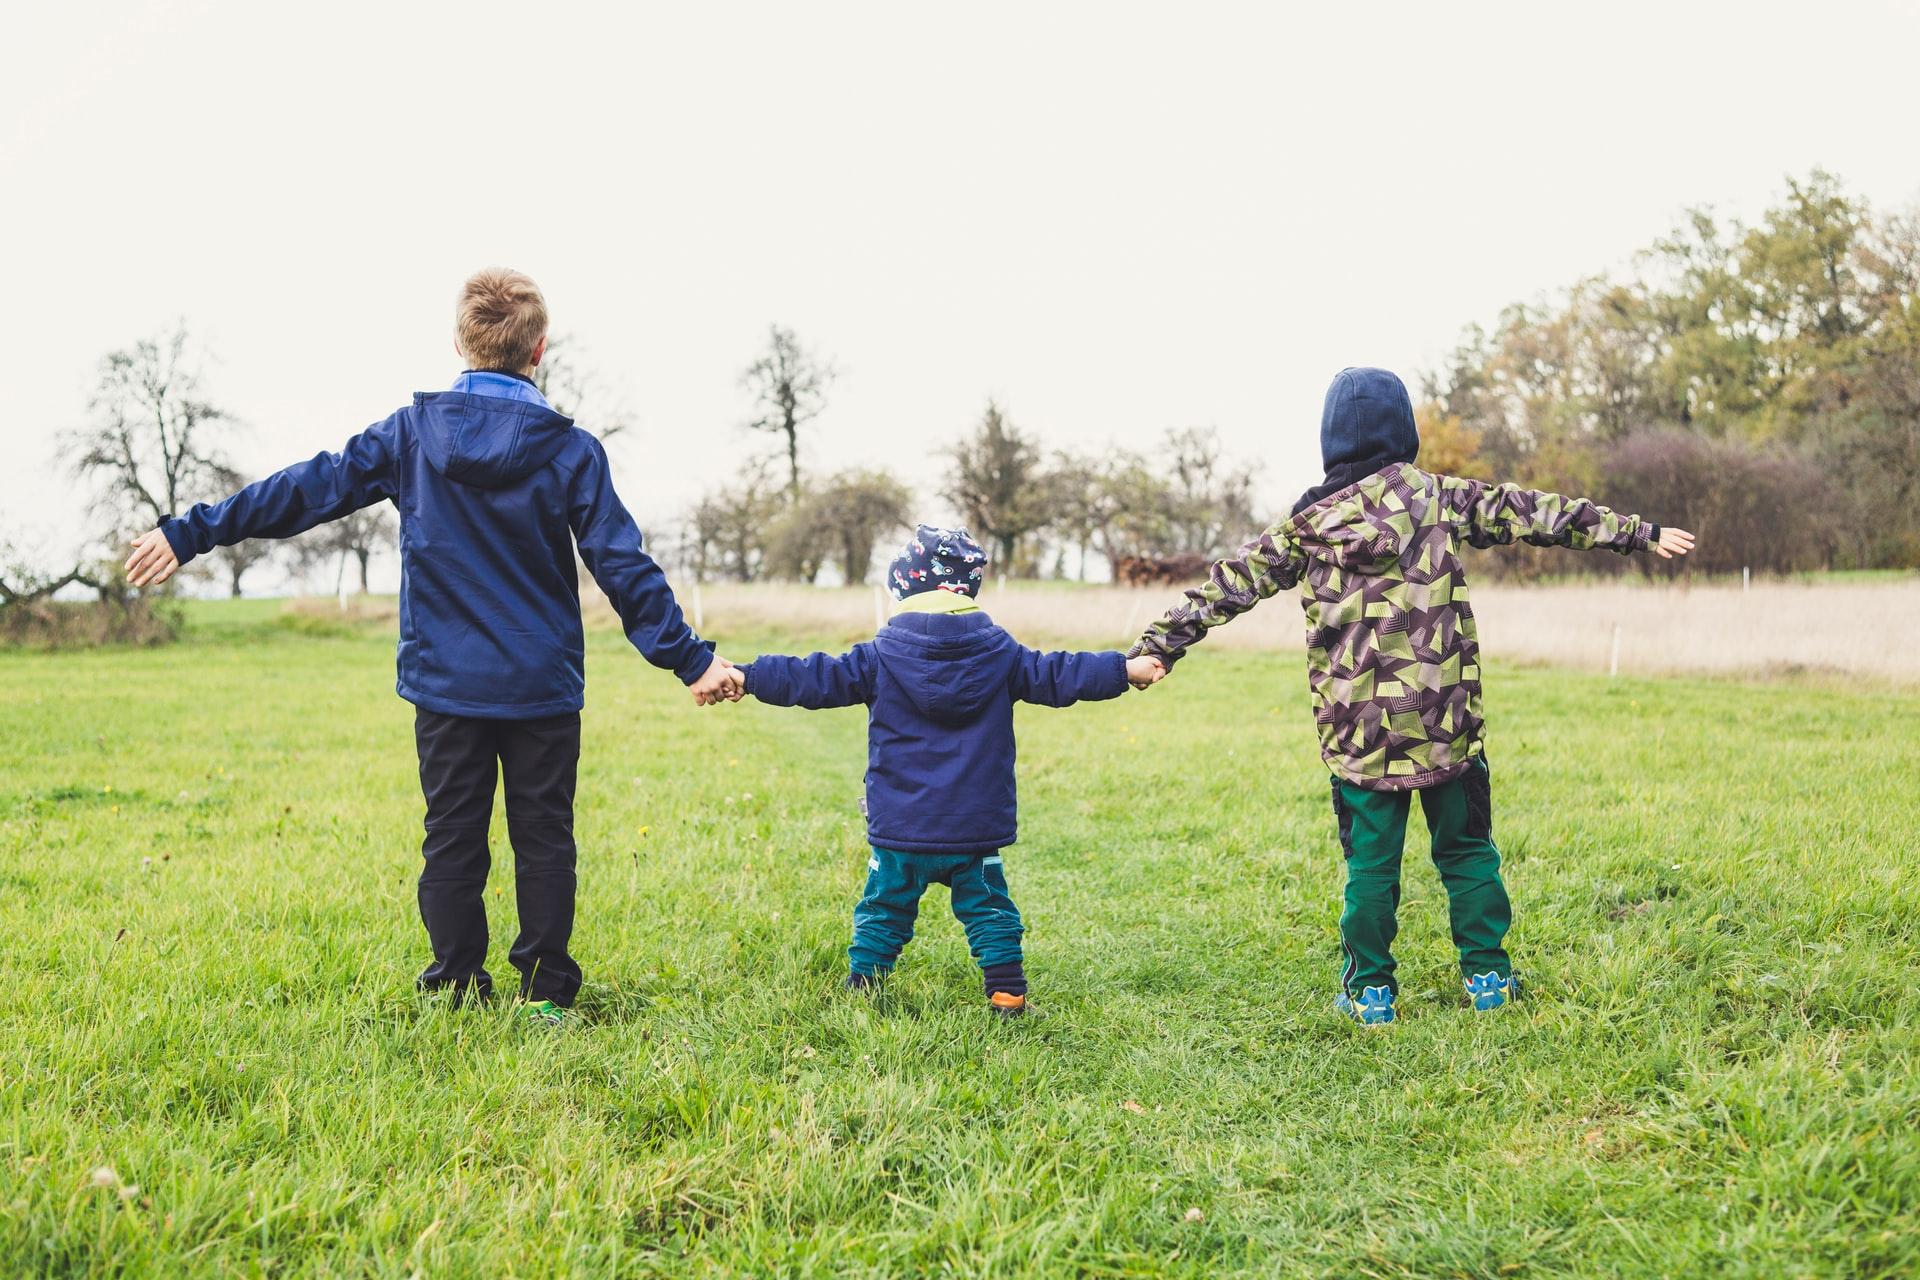 Poštovanje dječijih prava – temelj naprednog društva